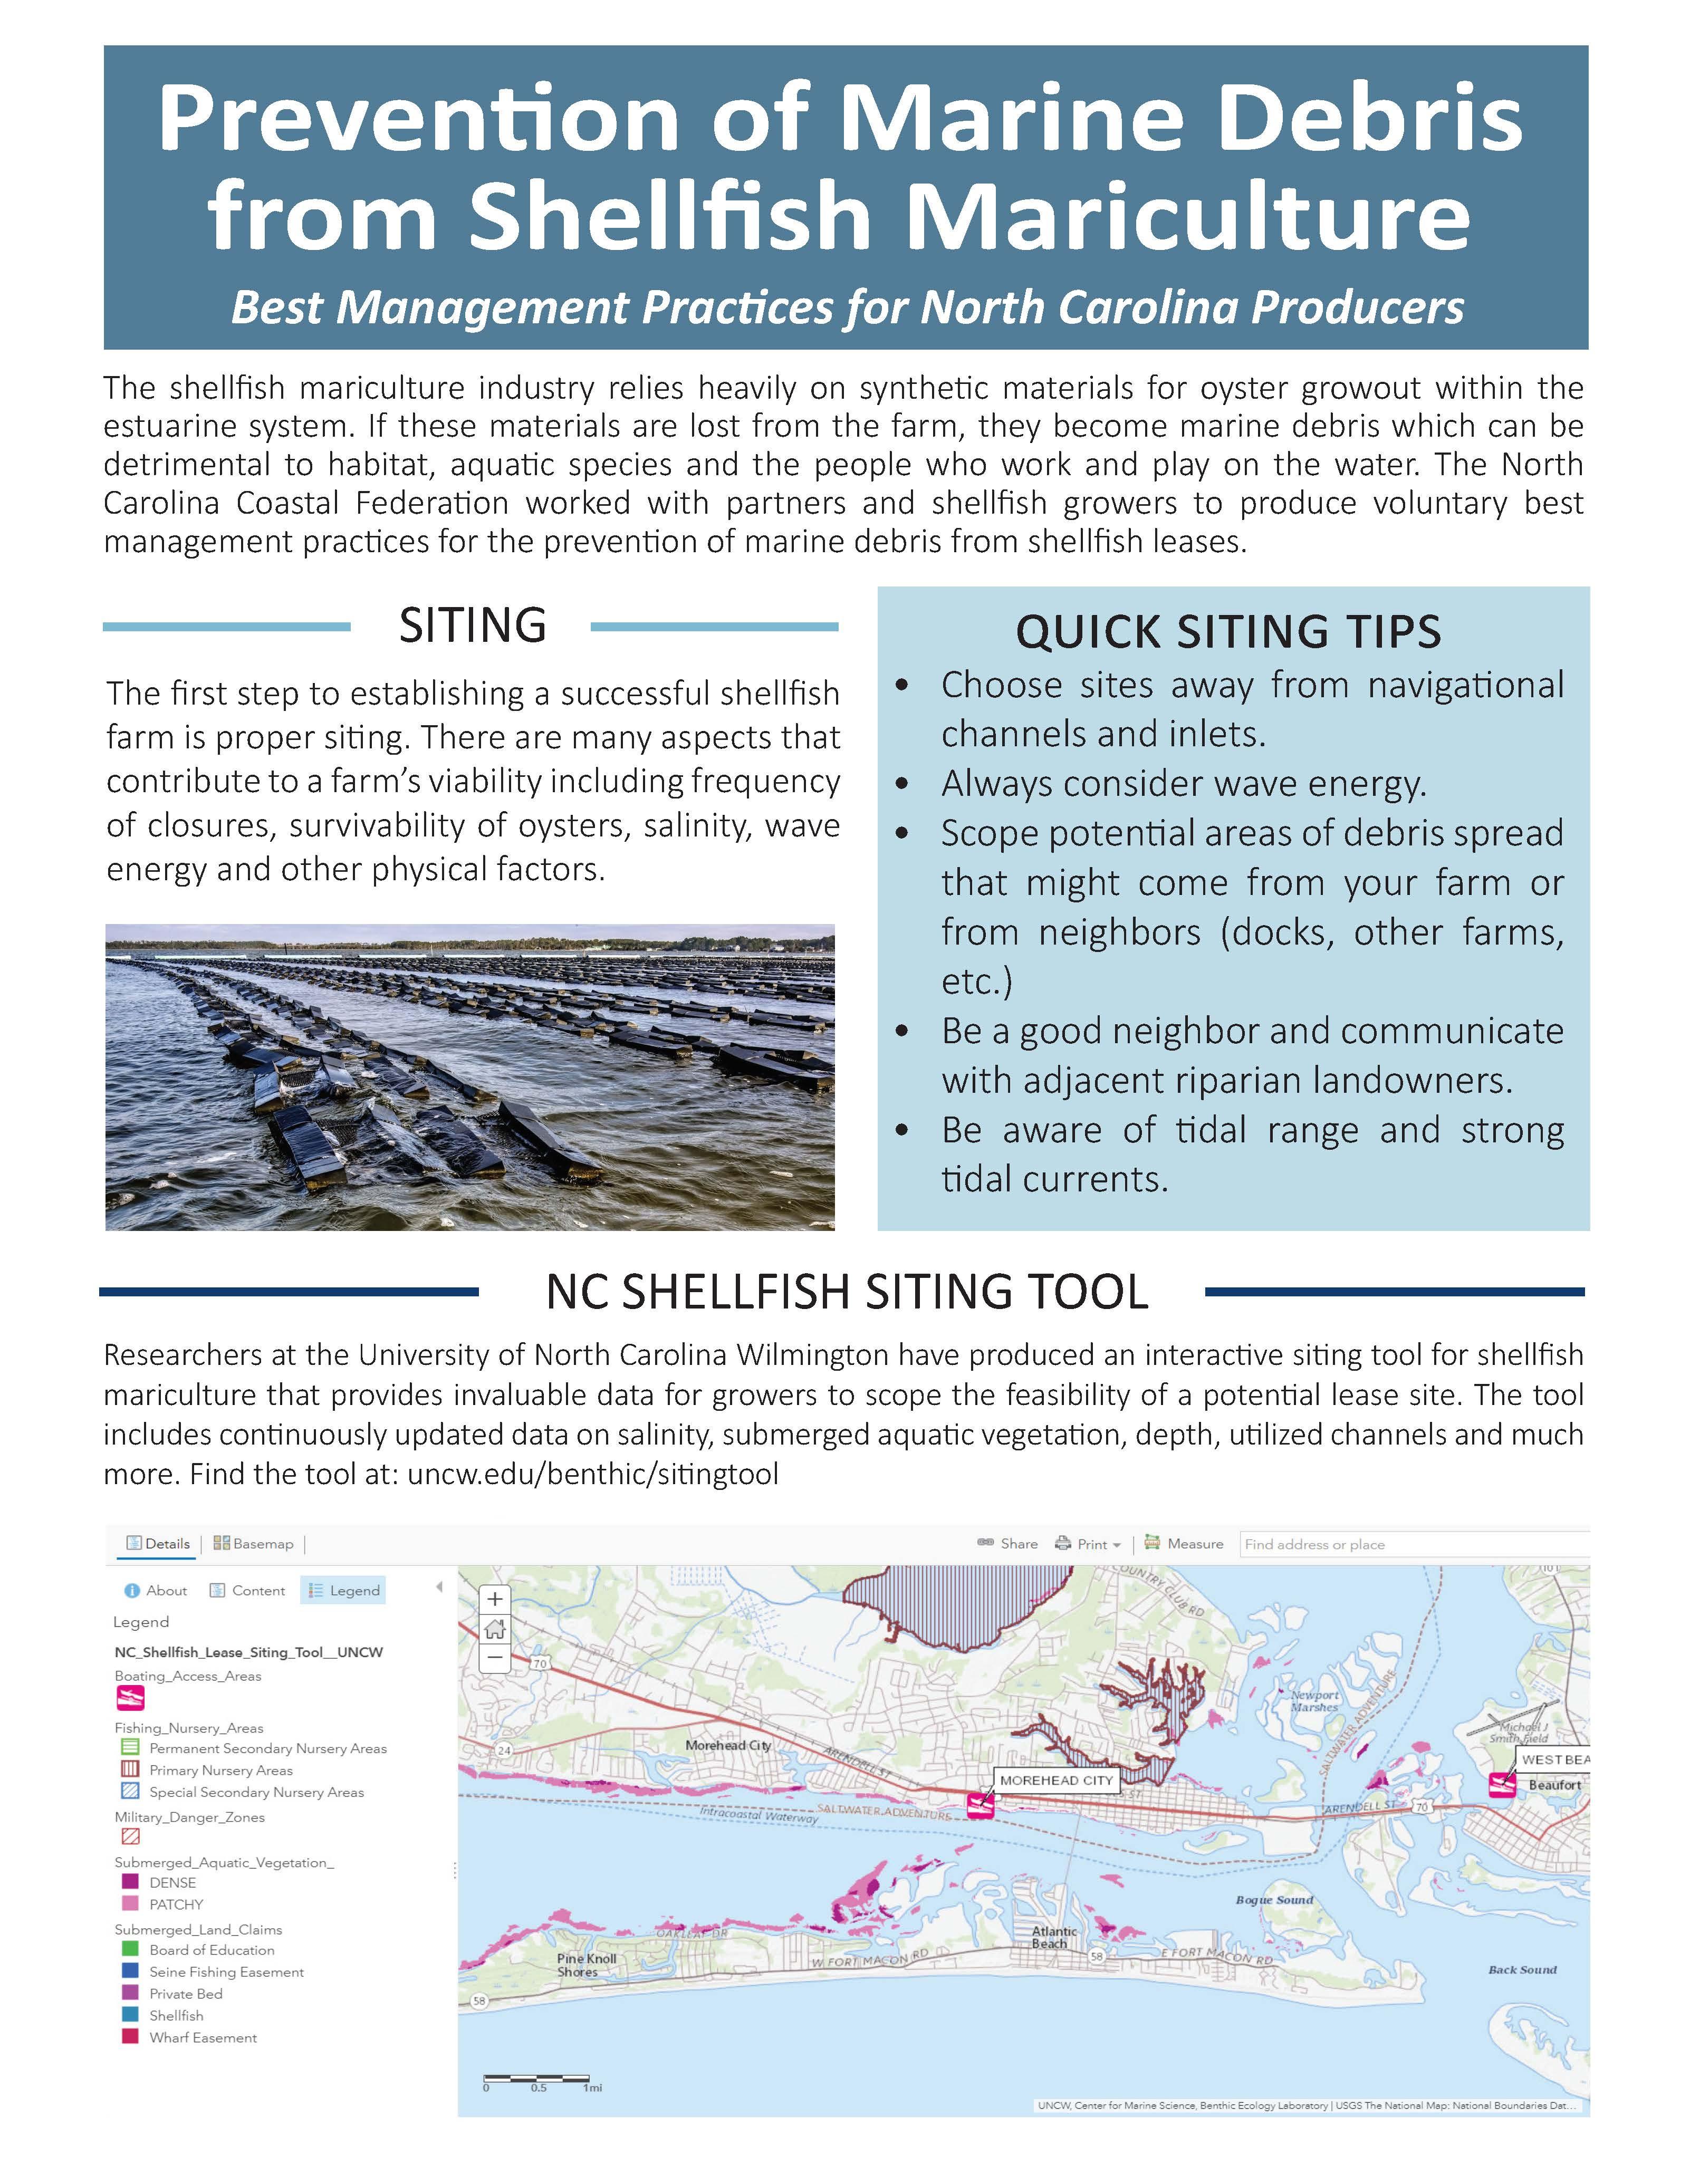 Best Management Practices Fact Sheet